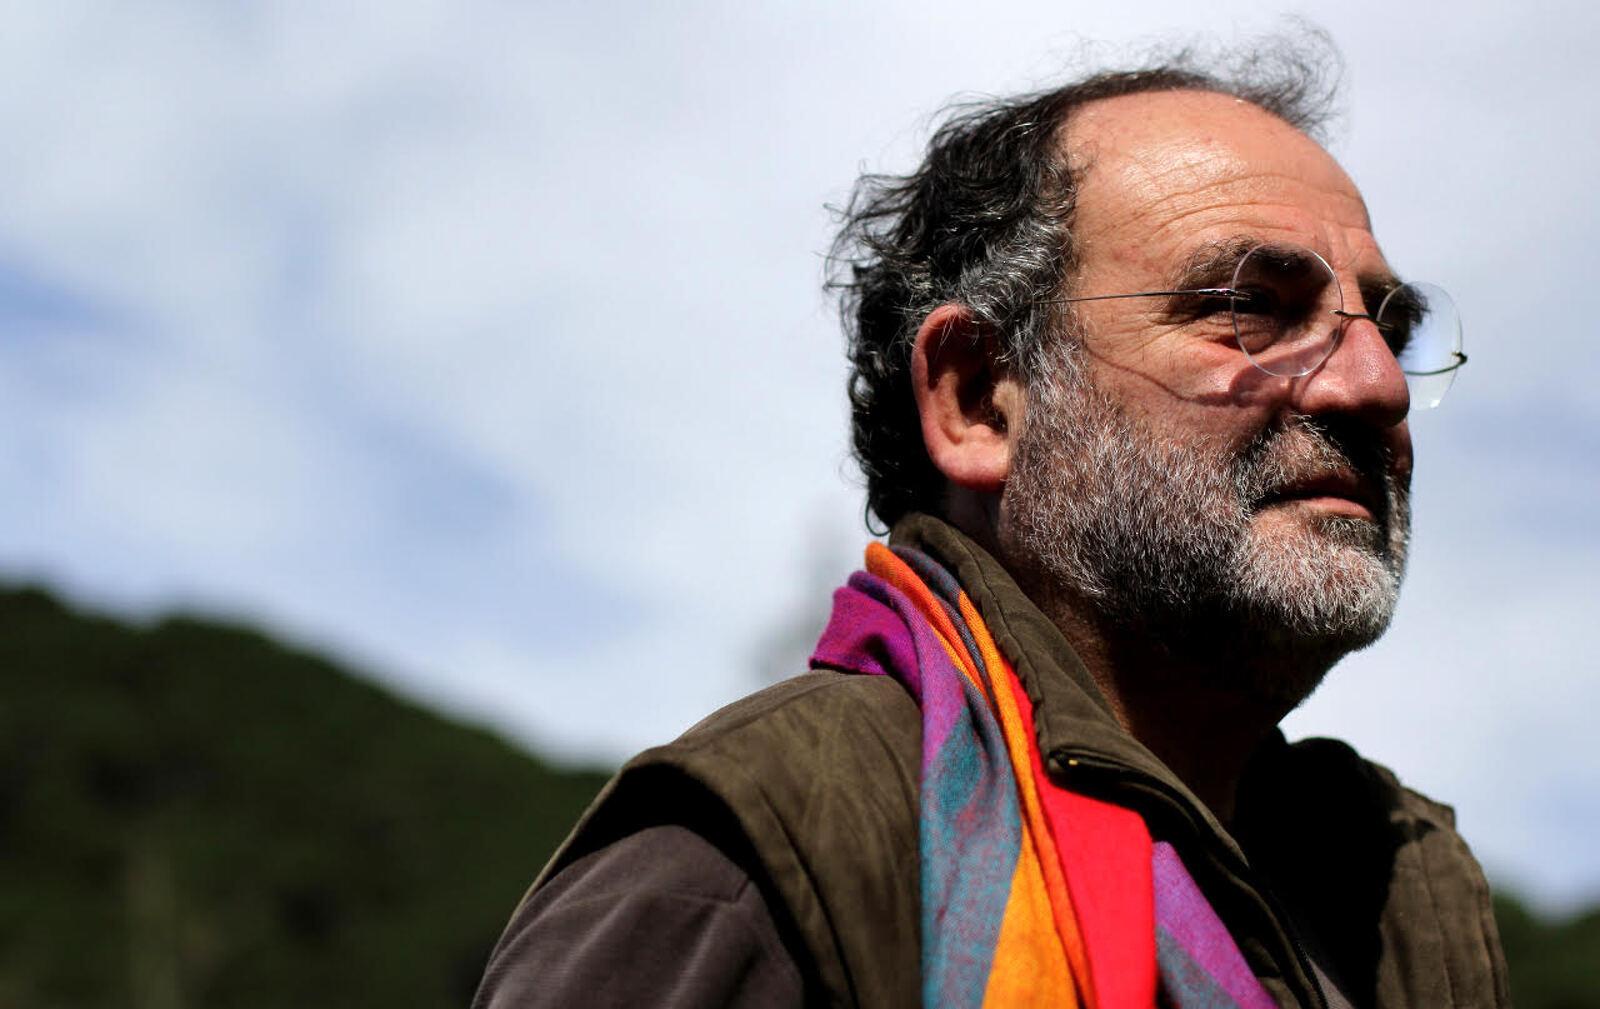 Josep Maria Fericgla